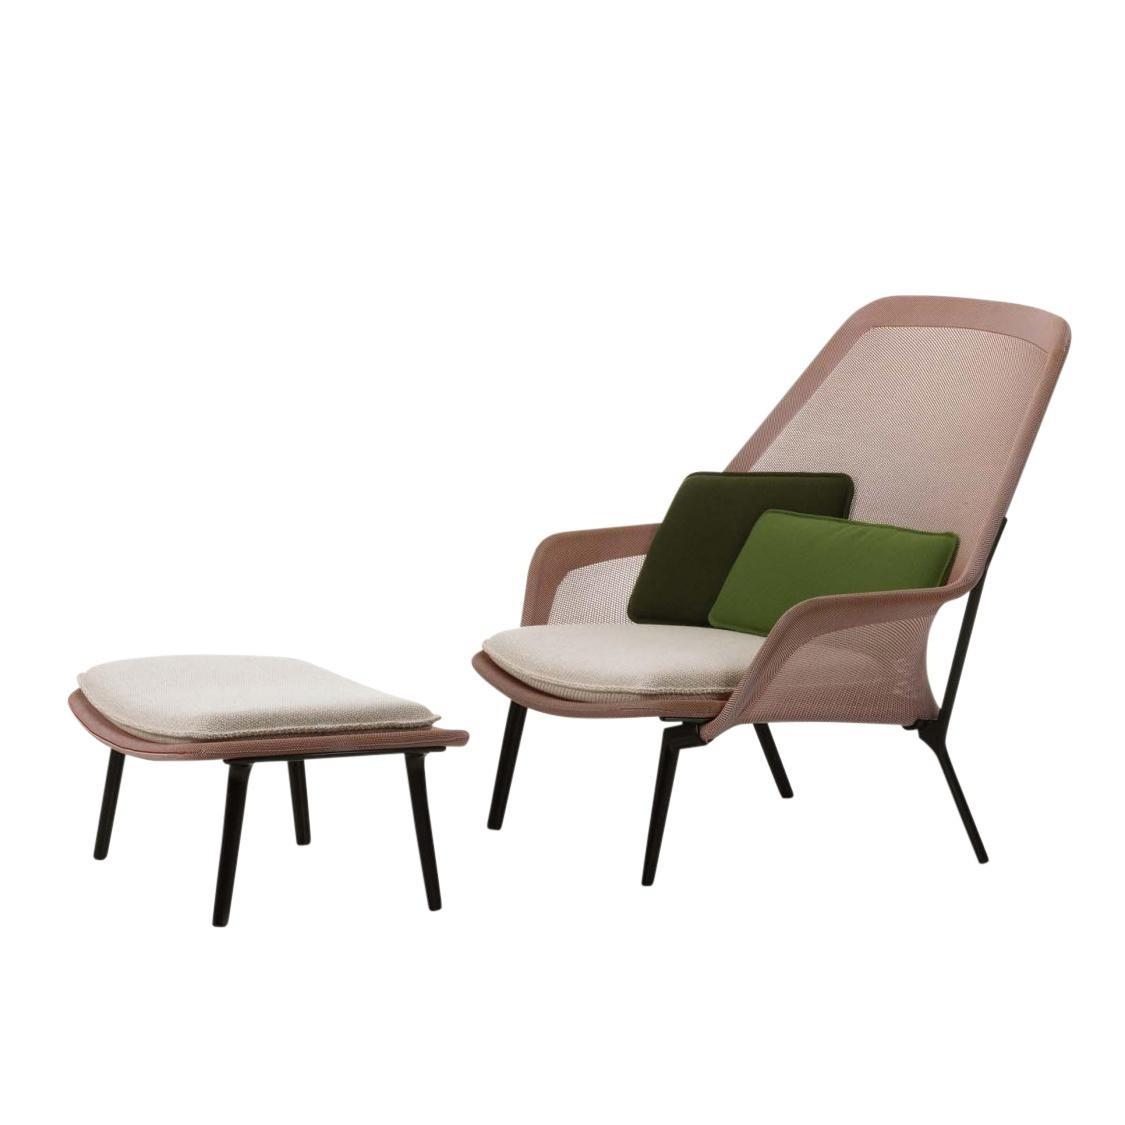 slow chair lounge chair ottoman